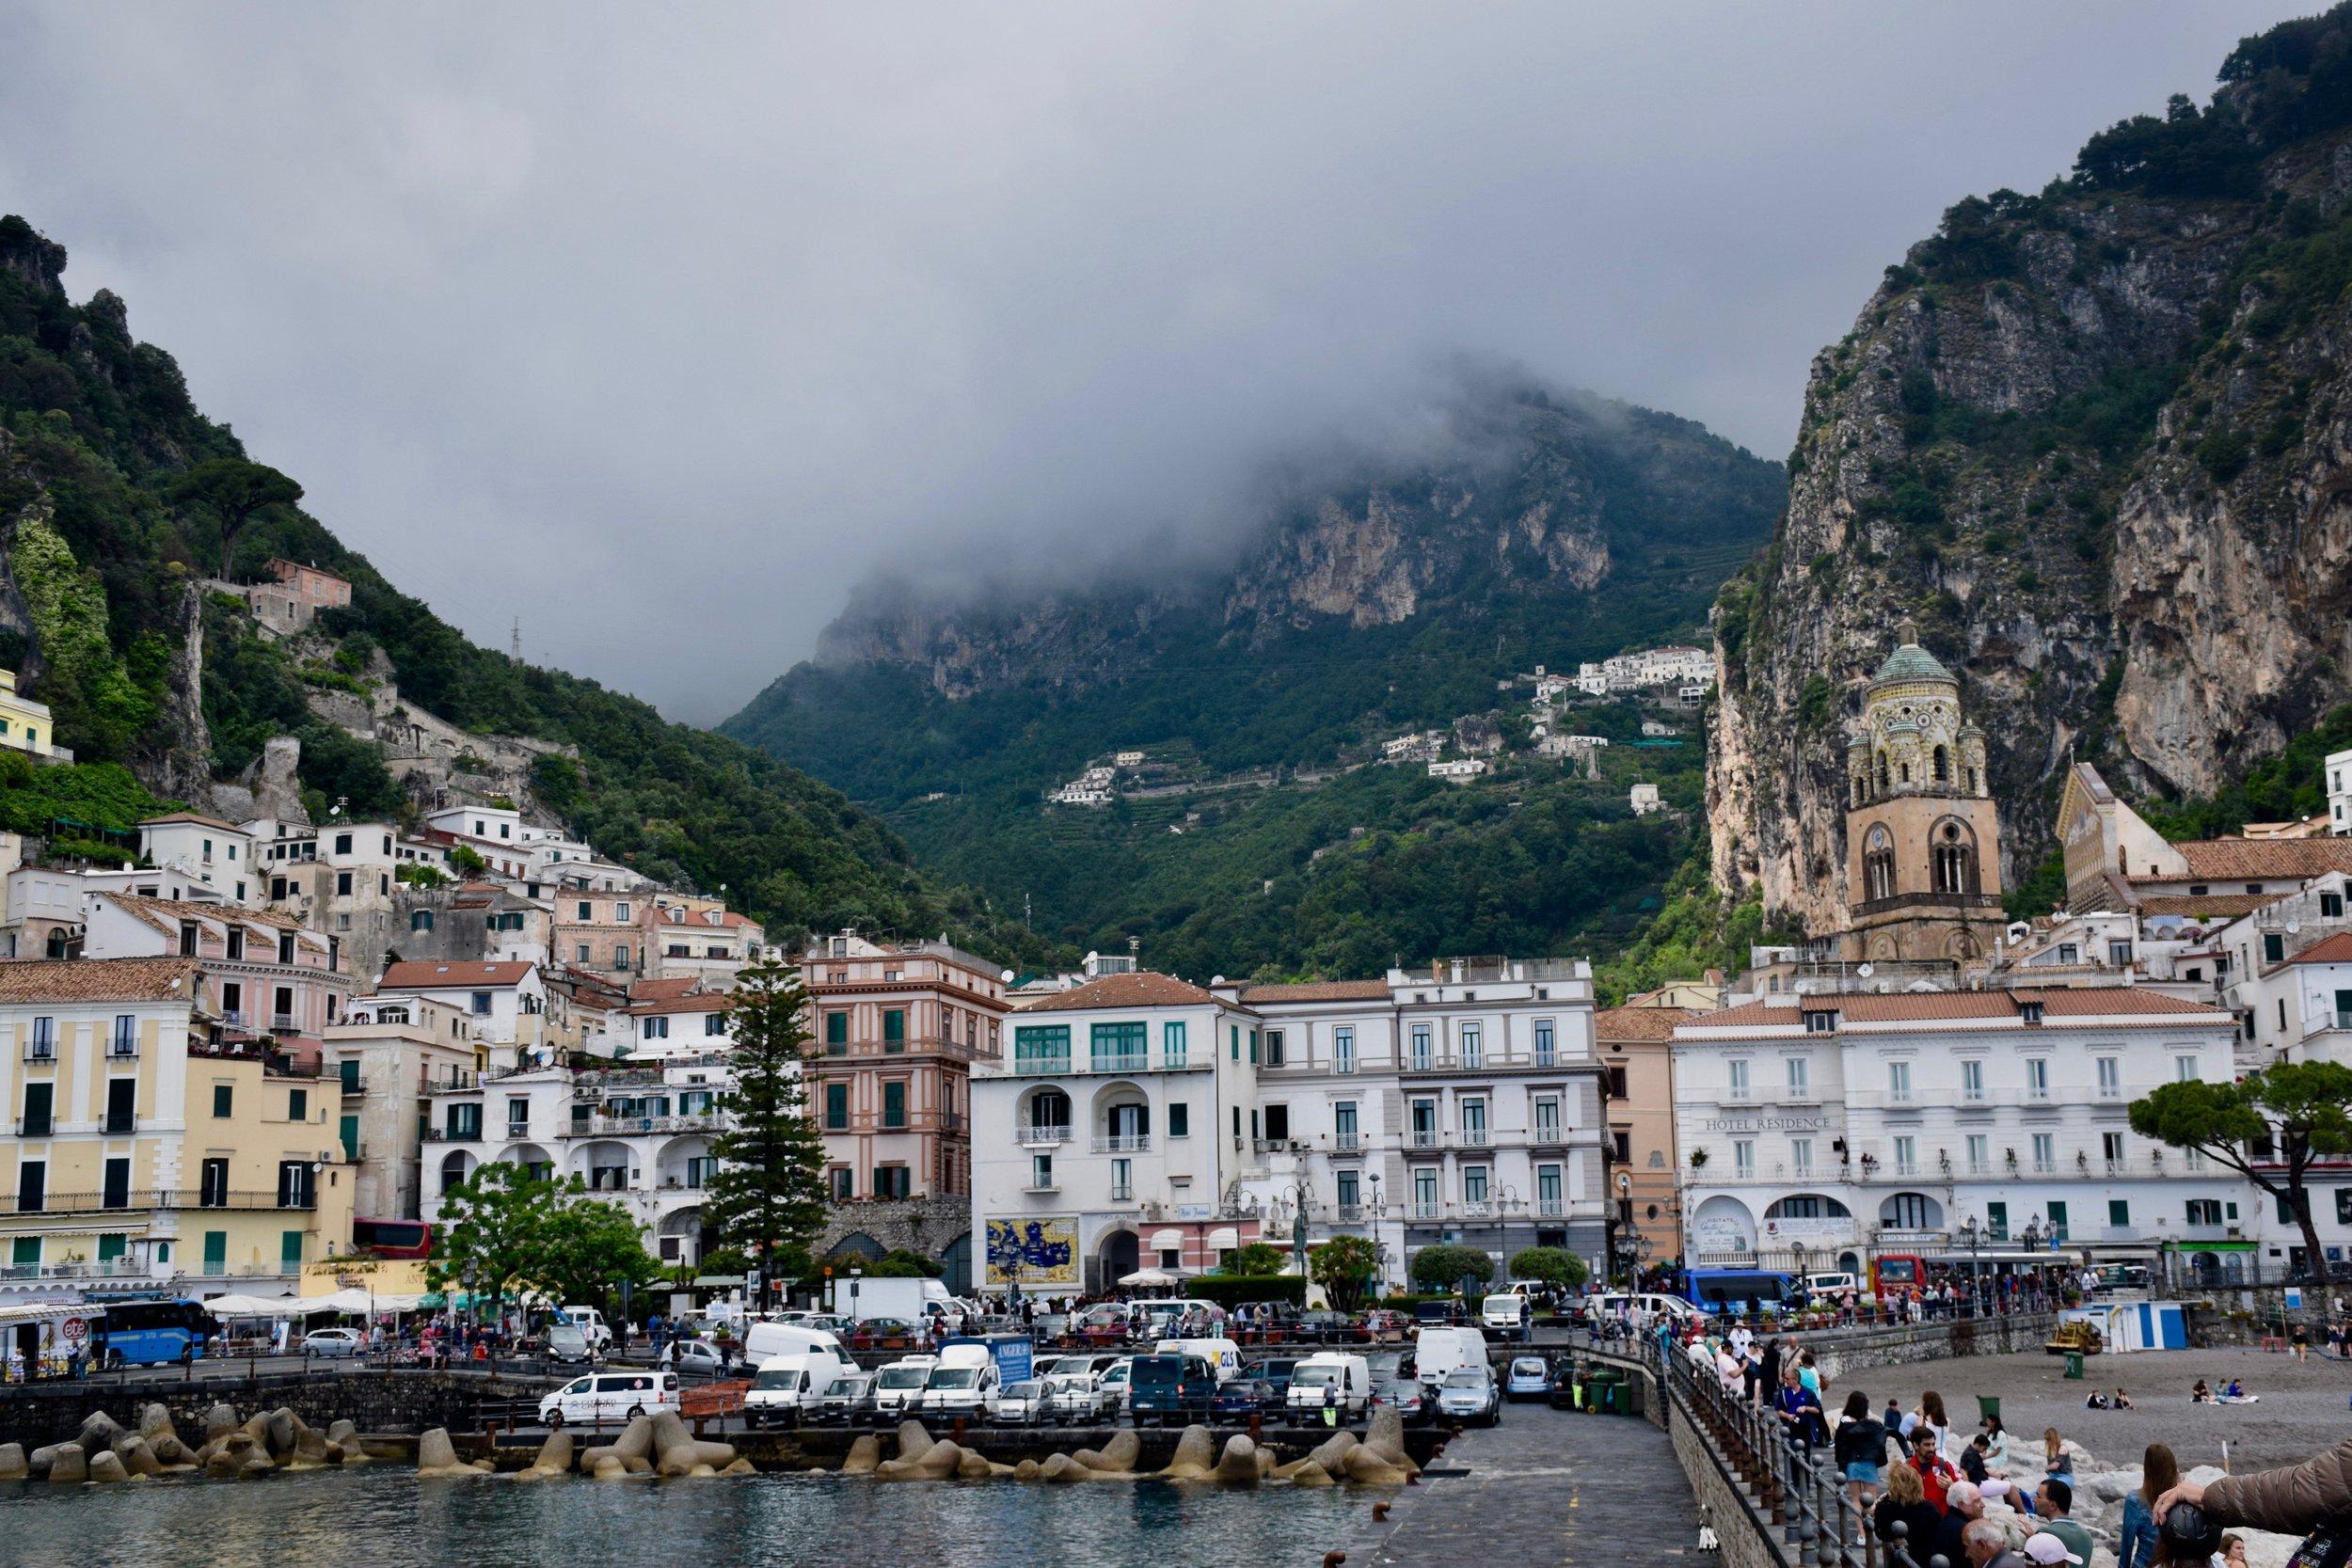 Amalfi, Italy, summer 2018.